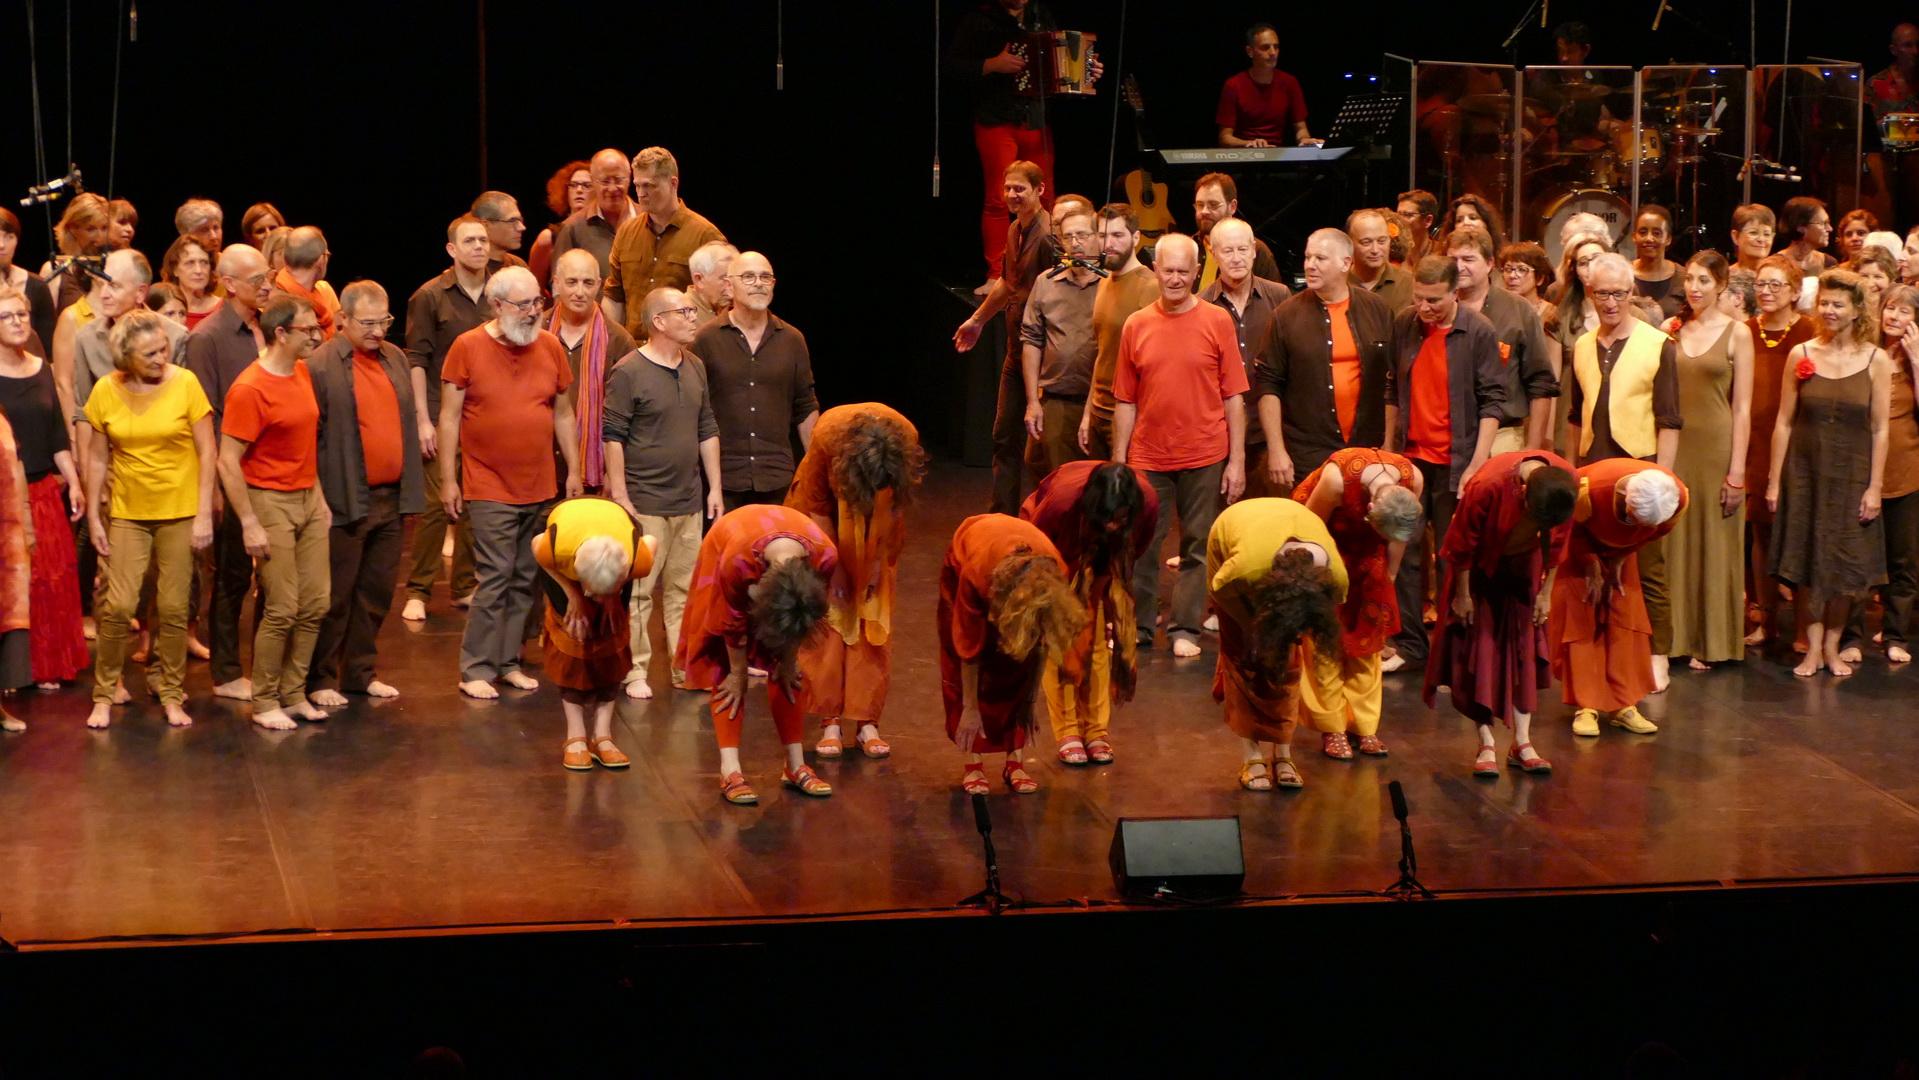 LFDS_concert_ailleurs (83)